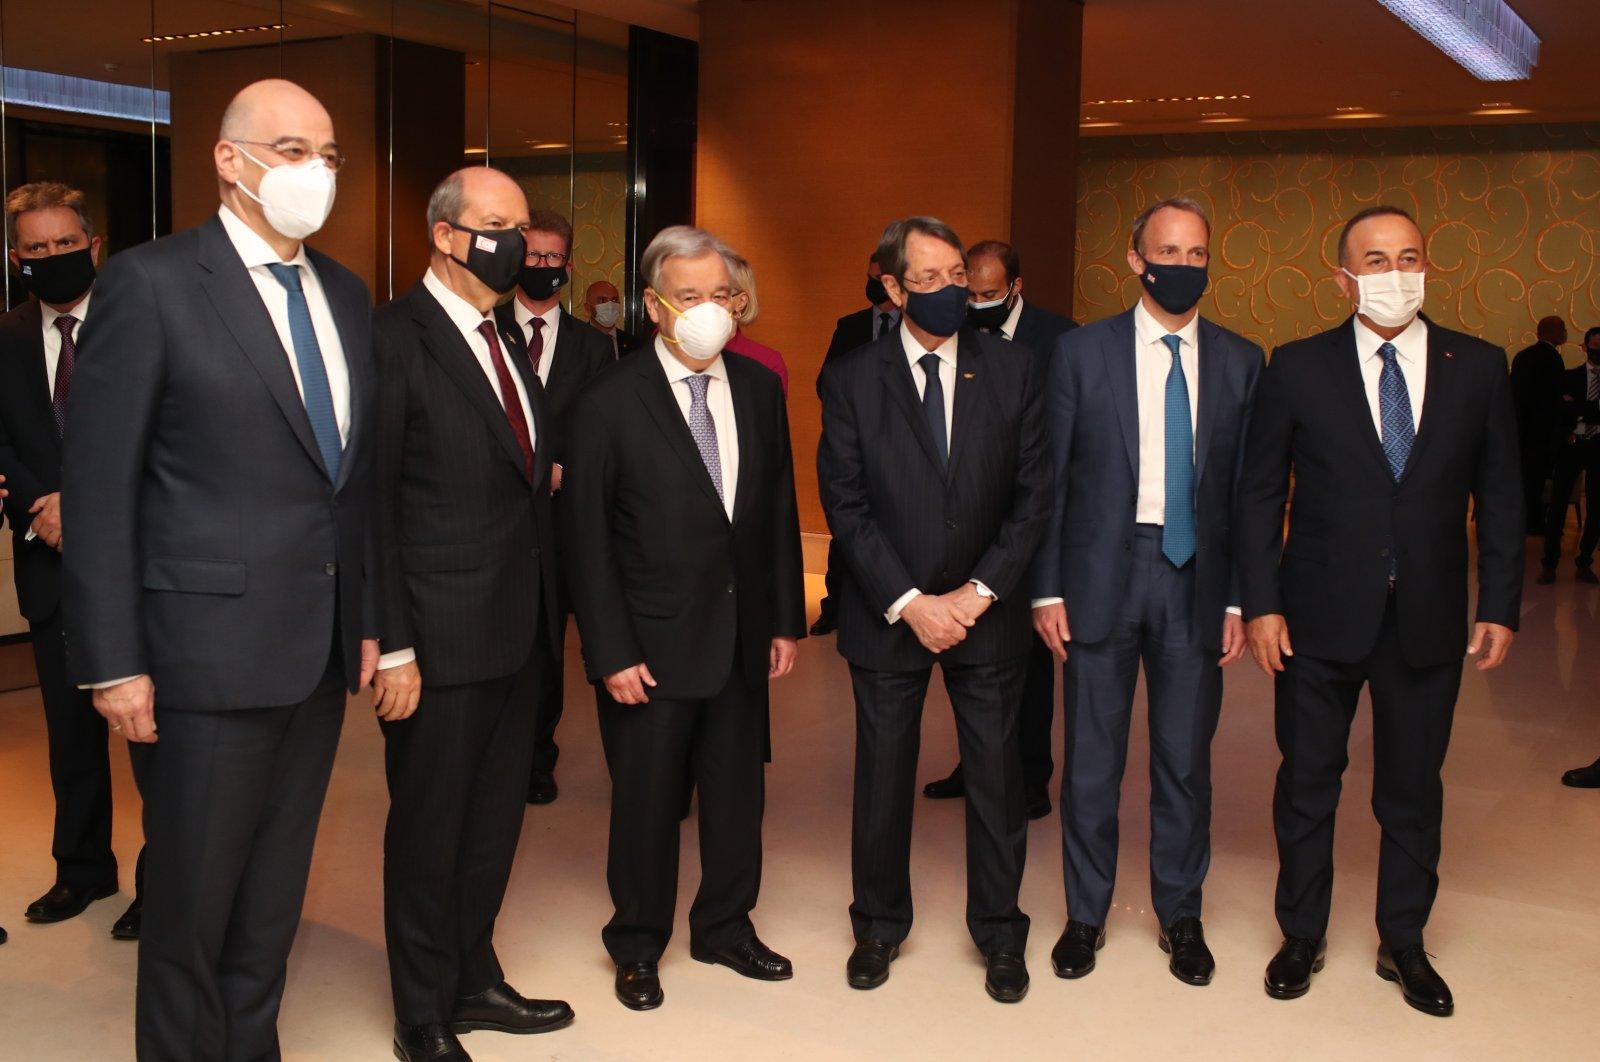 TRNC President Tatar (2-L), Foreign Minister Çavuşoğlu (R) UN chief Guterres (3-L), UK FM Raab (2-R), Greek FM Dendias (L) and Greek Cypriot leader Anastasiades (3-R) meet in Geneva on Apr. 27, 2021 (AA Photo)